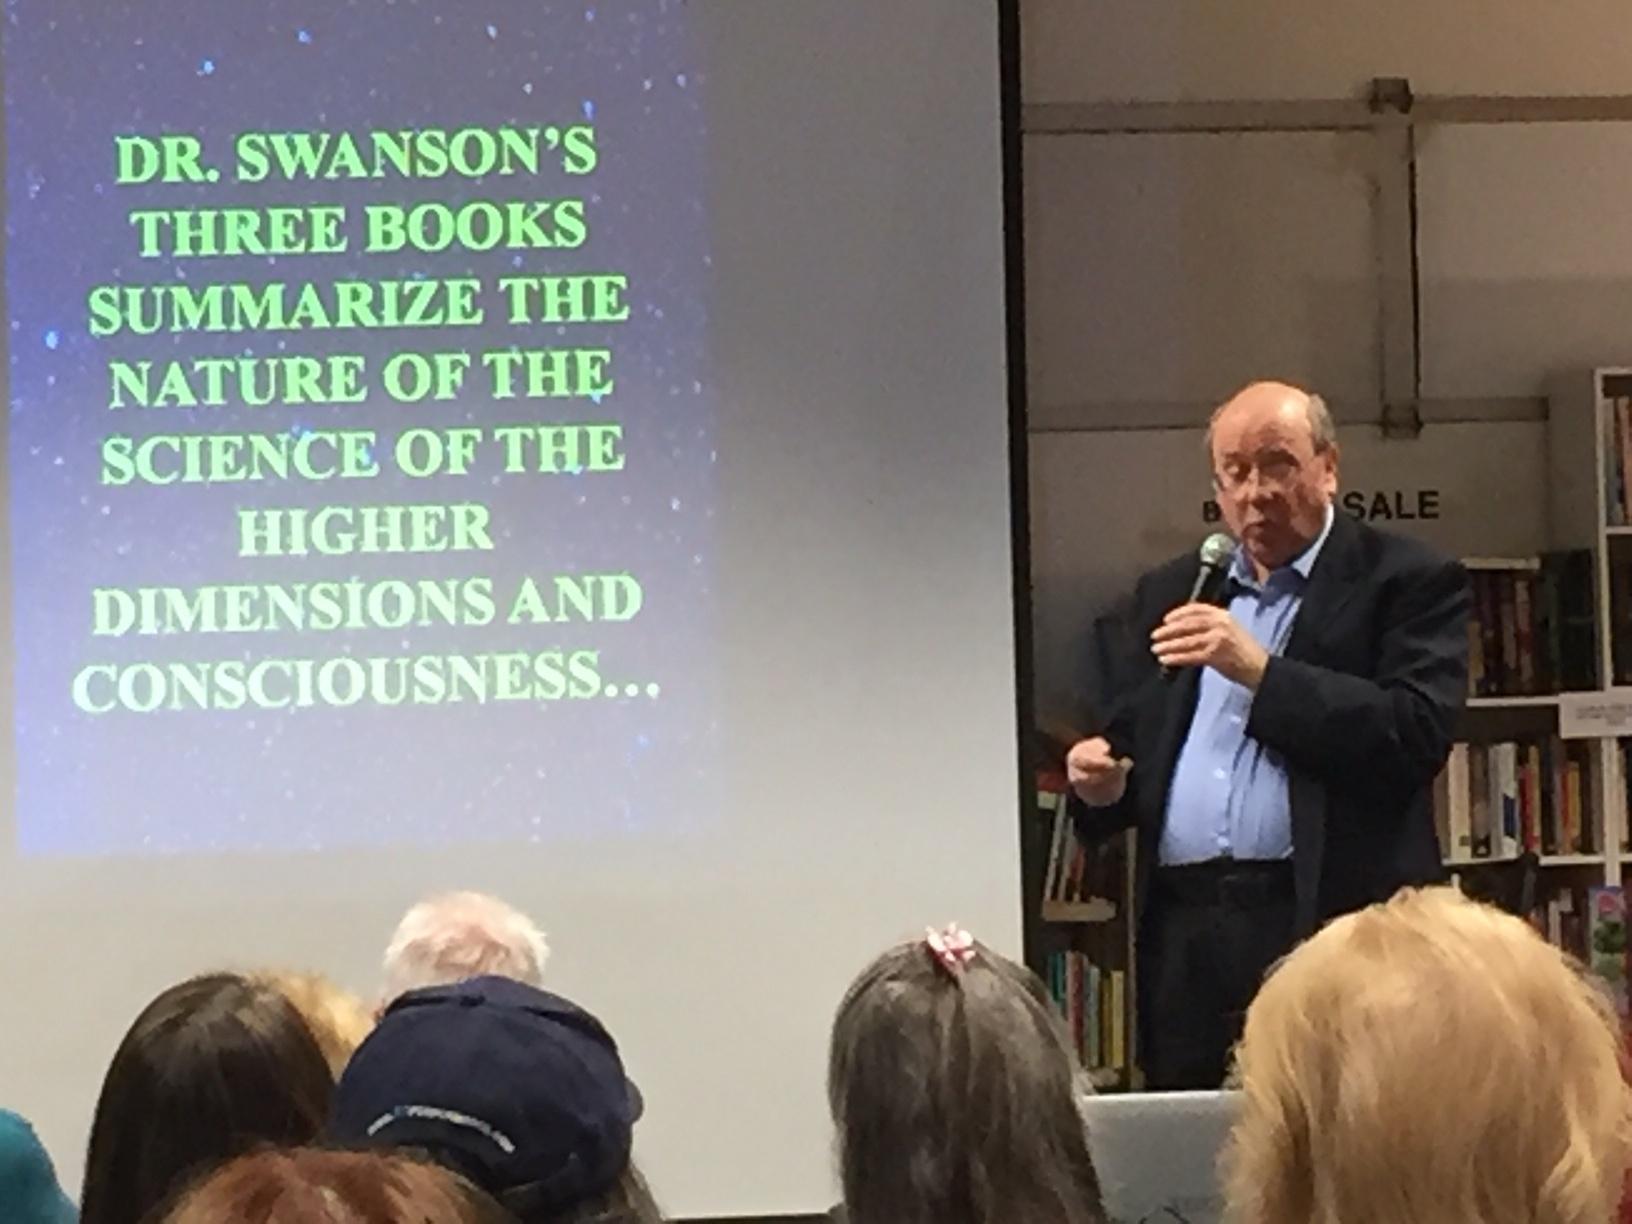 Physicist Claude Swanson Ph.D.